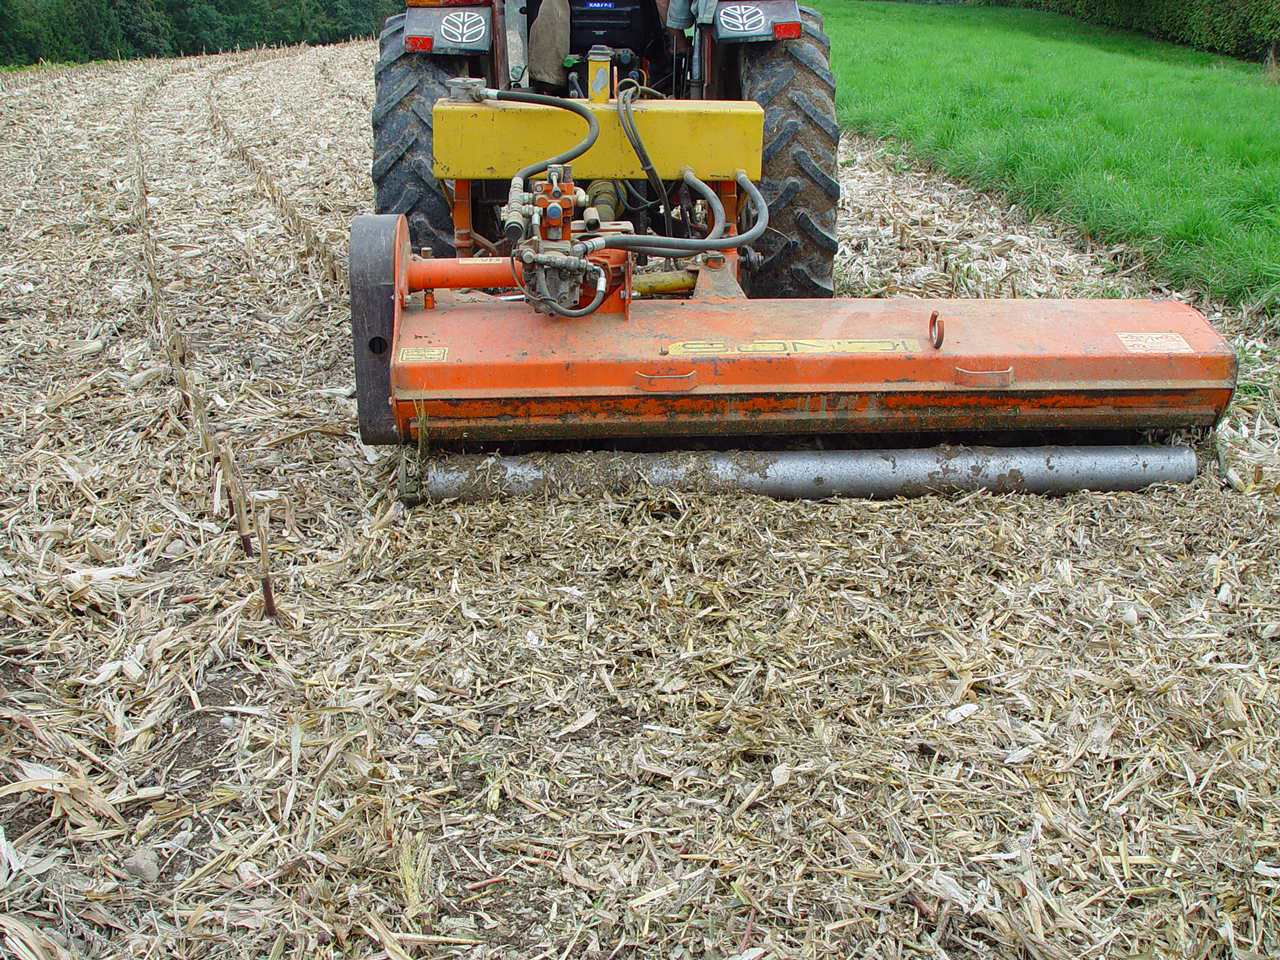 Maiszünsler-Bekämpfung durch Mulchen